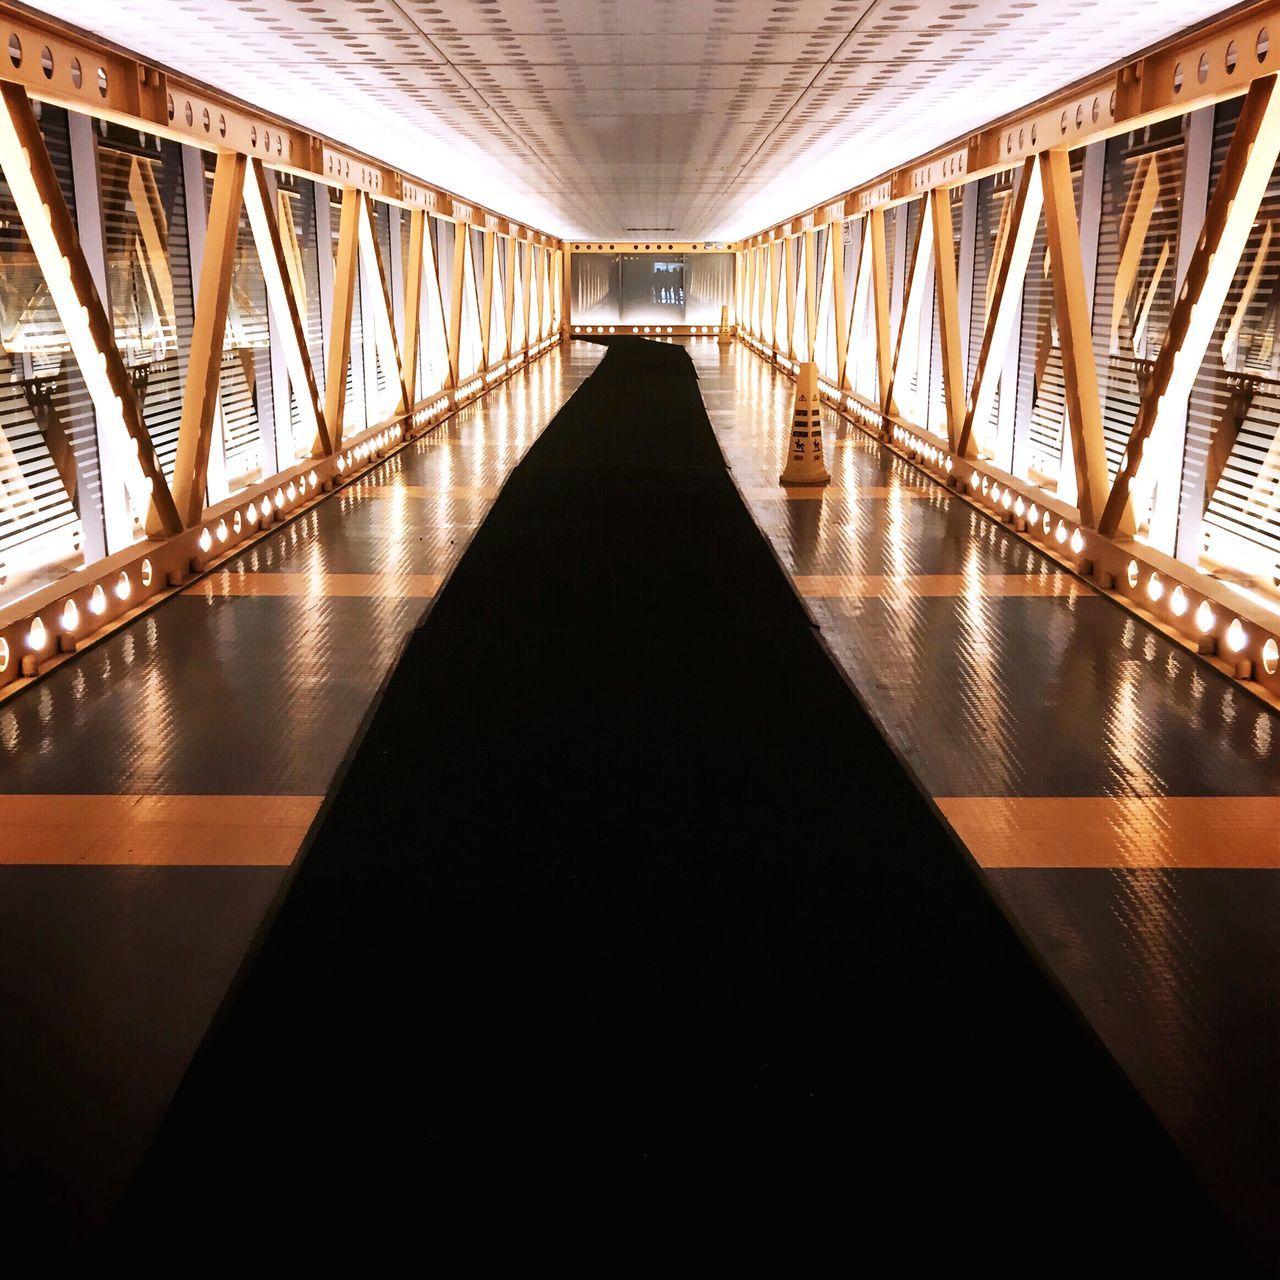 Chicago. EyeEm EyeEm Best Shots Eye4photography  Chicago Architecture Urban EyeEm Gallery Open Edit The Architect - 2015 EyeEm Awards